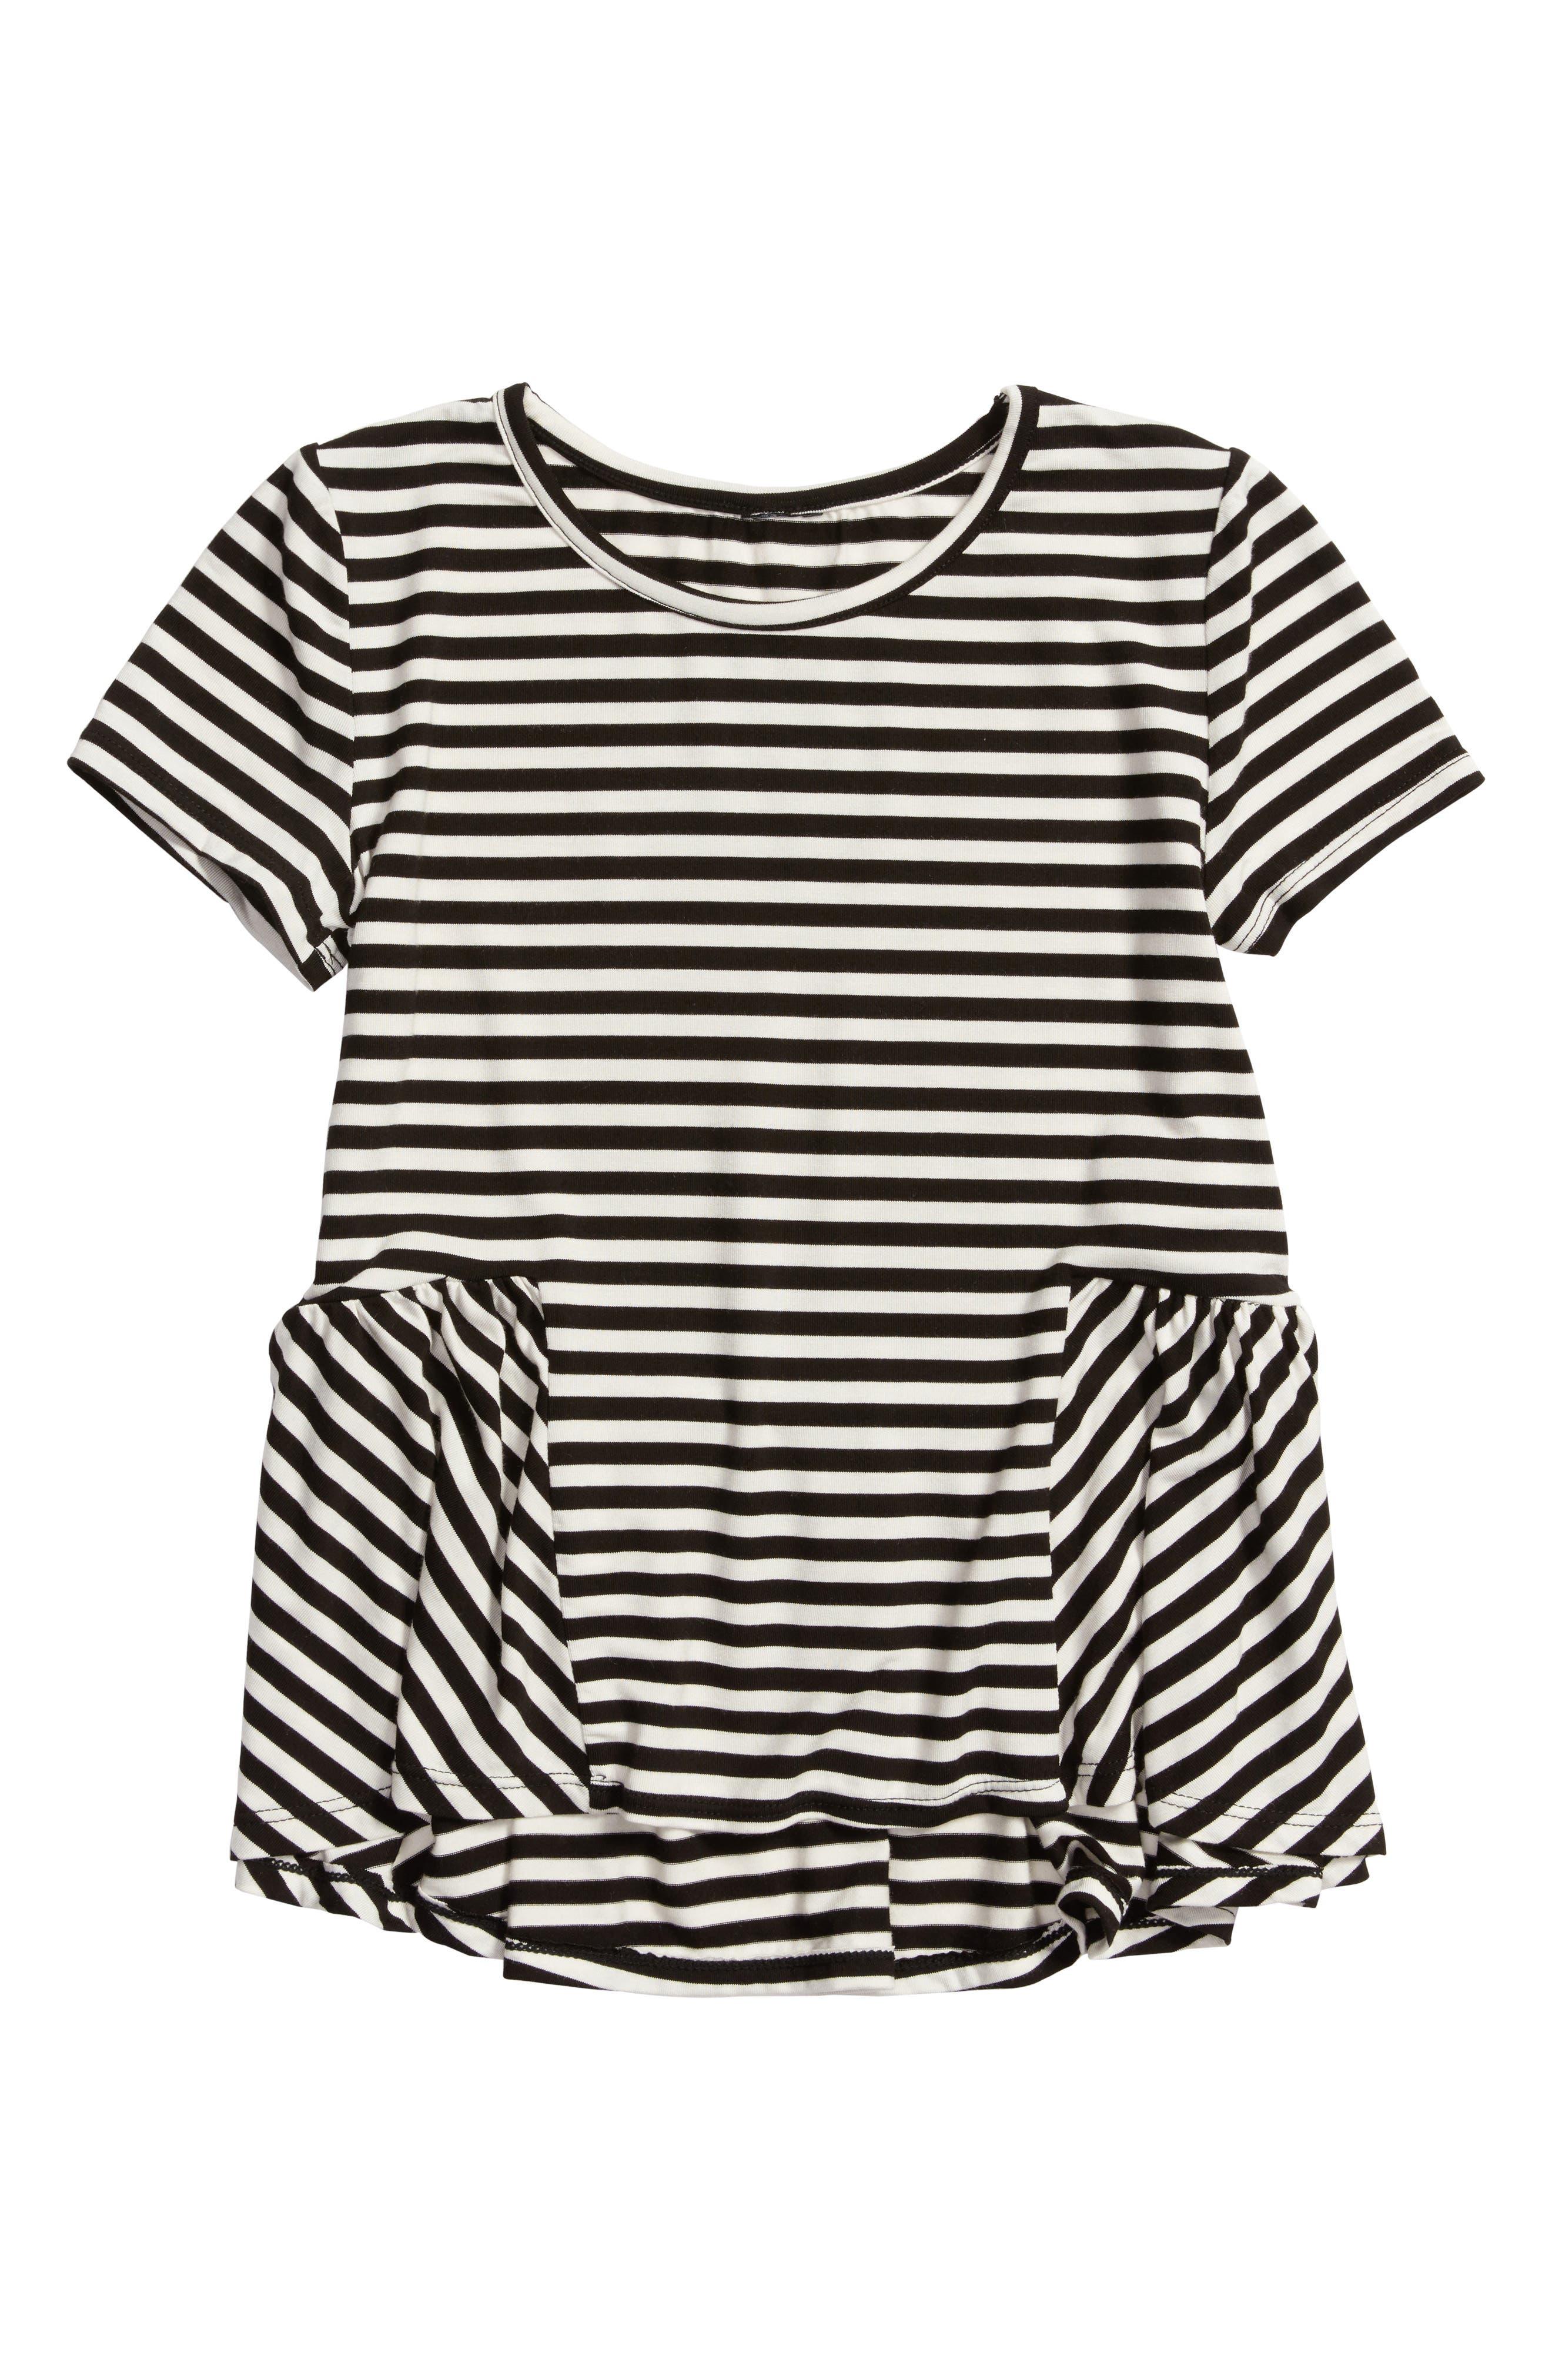 Peplum Tee,                         Main,                         color, Black/ White Stripe